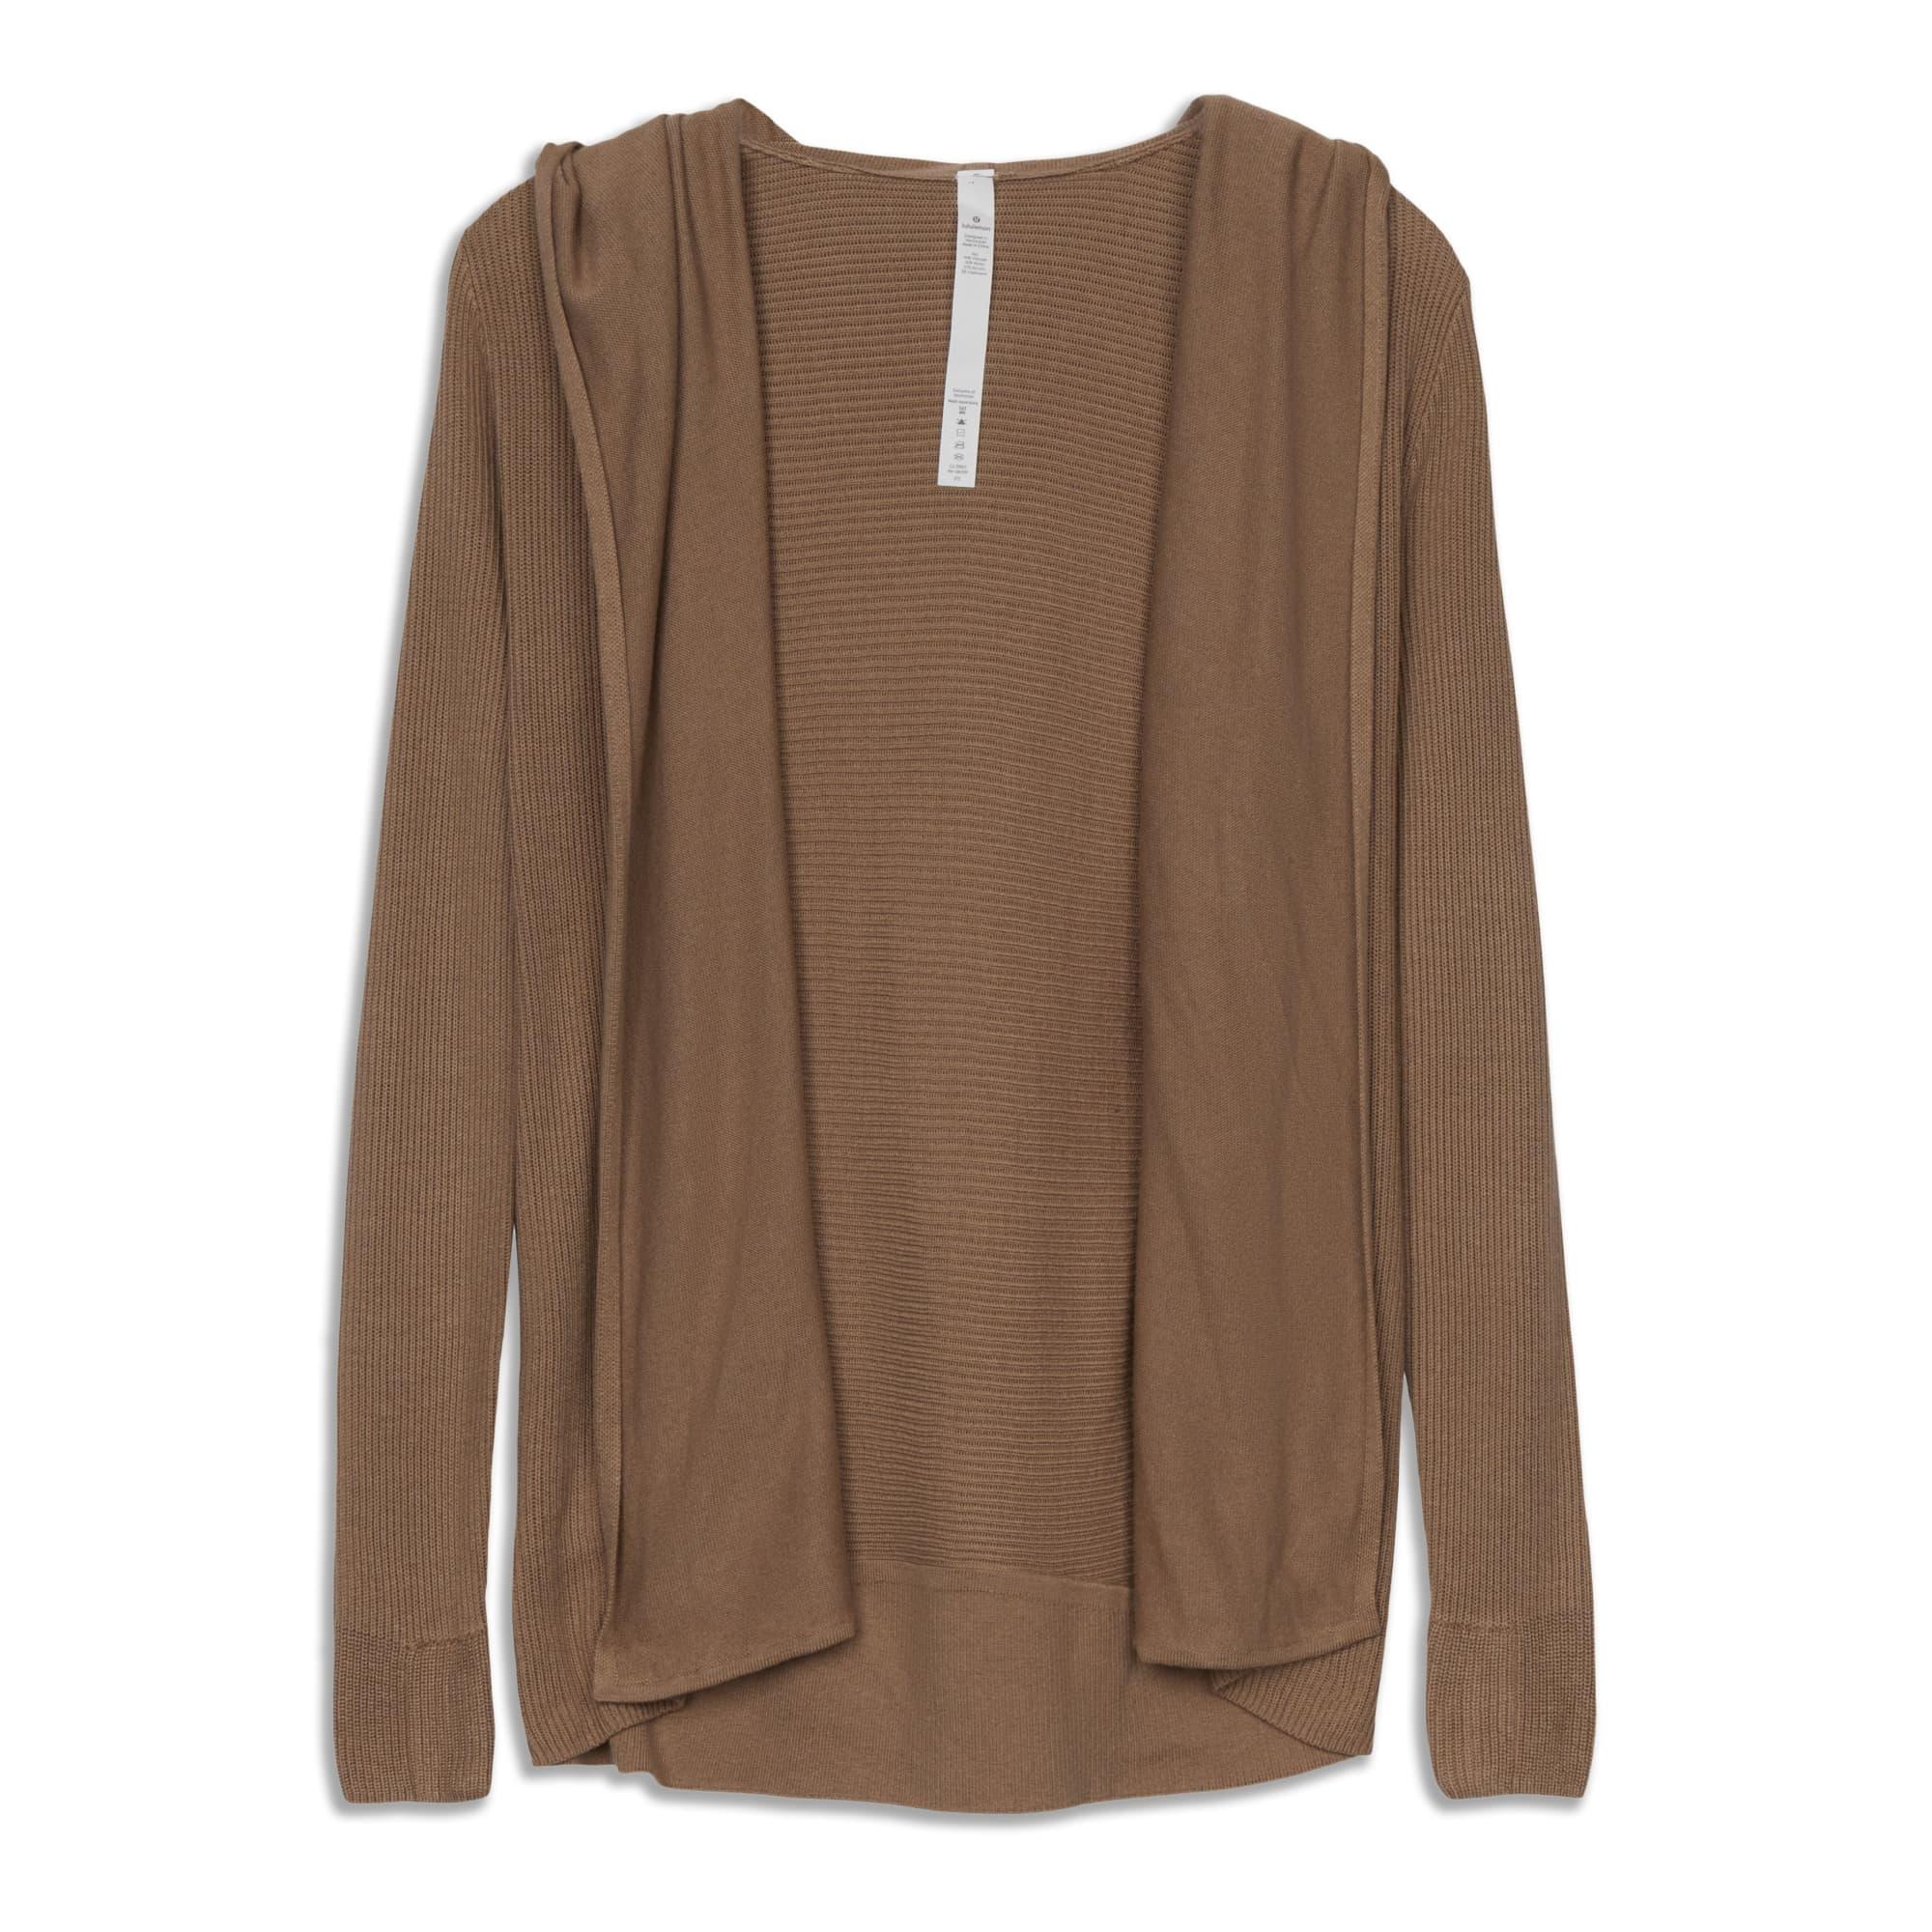 Main product image: Sundown Sweater Wrap - Resale